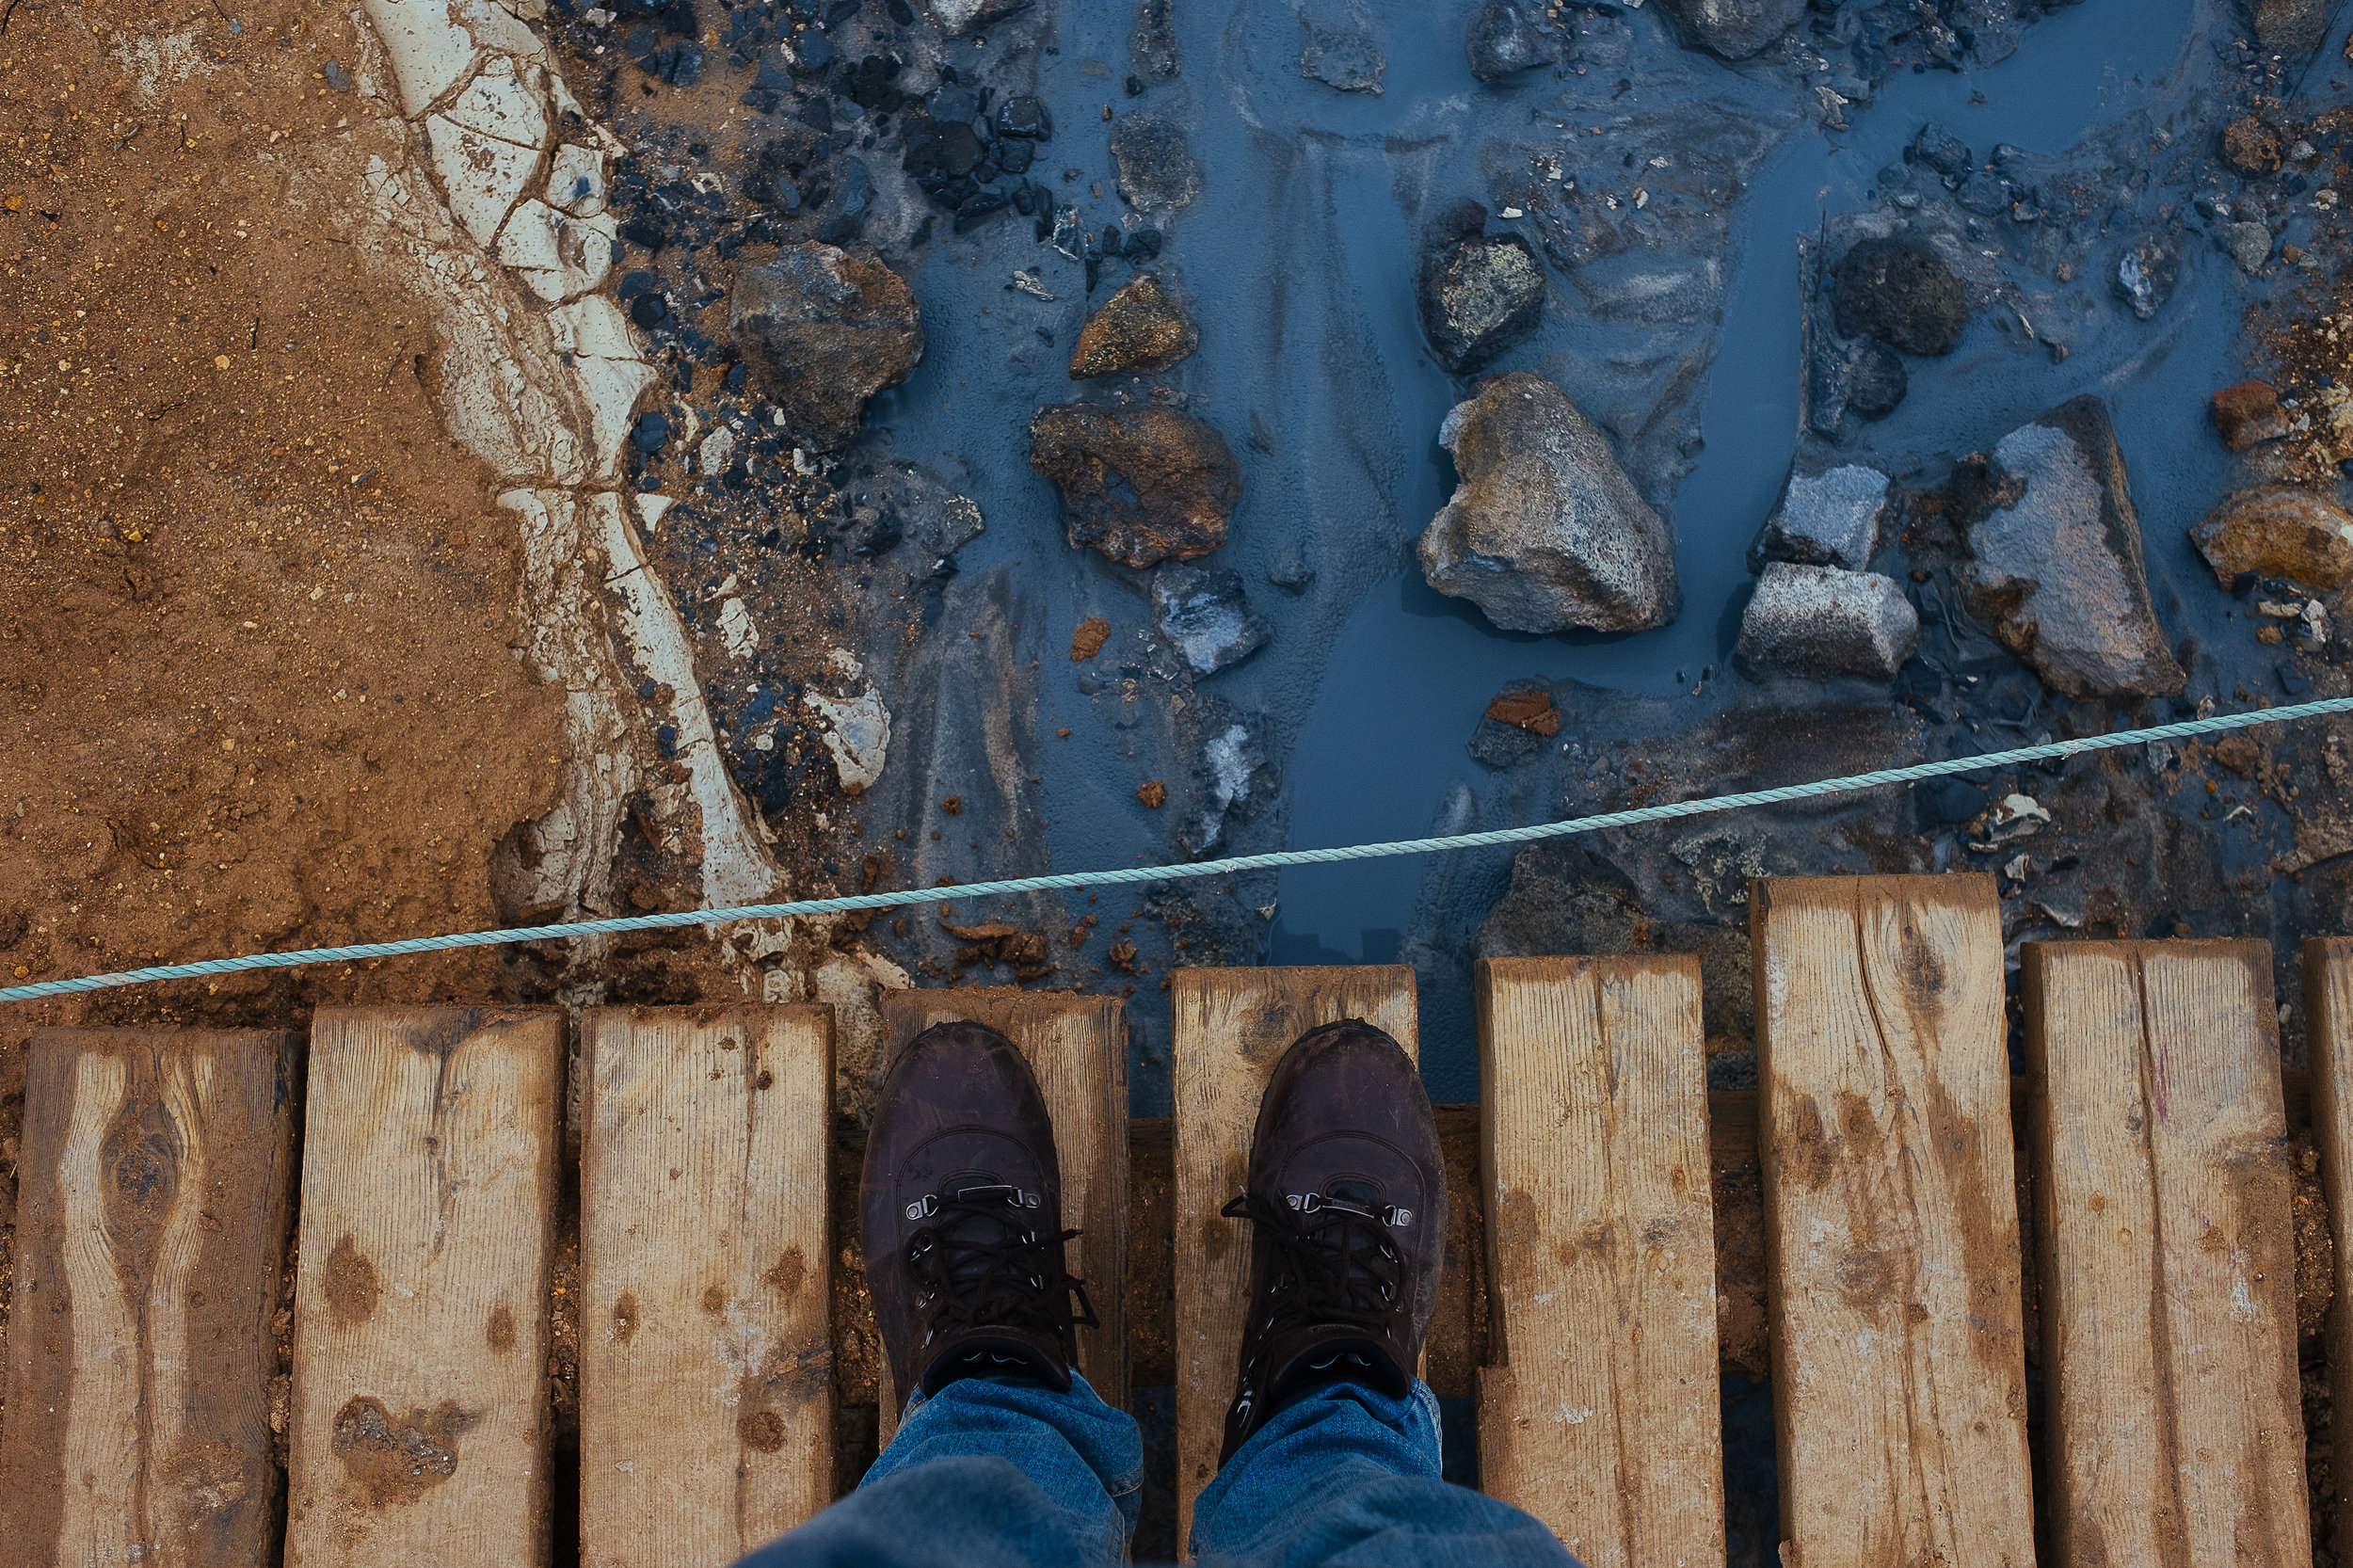 iceland feet-3.jpg